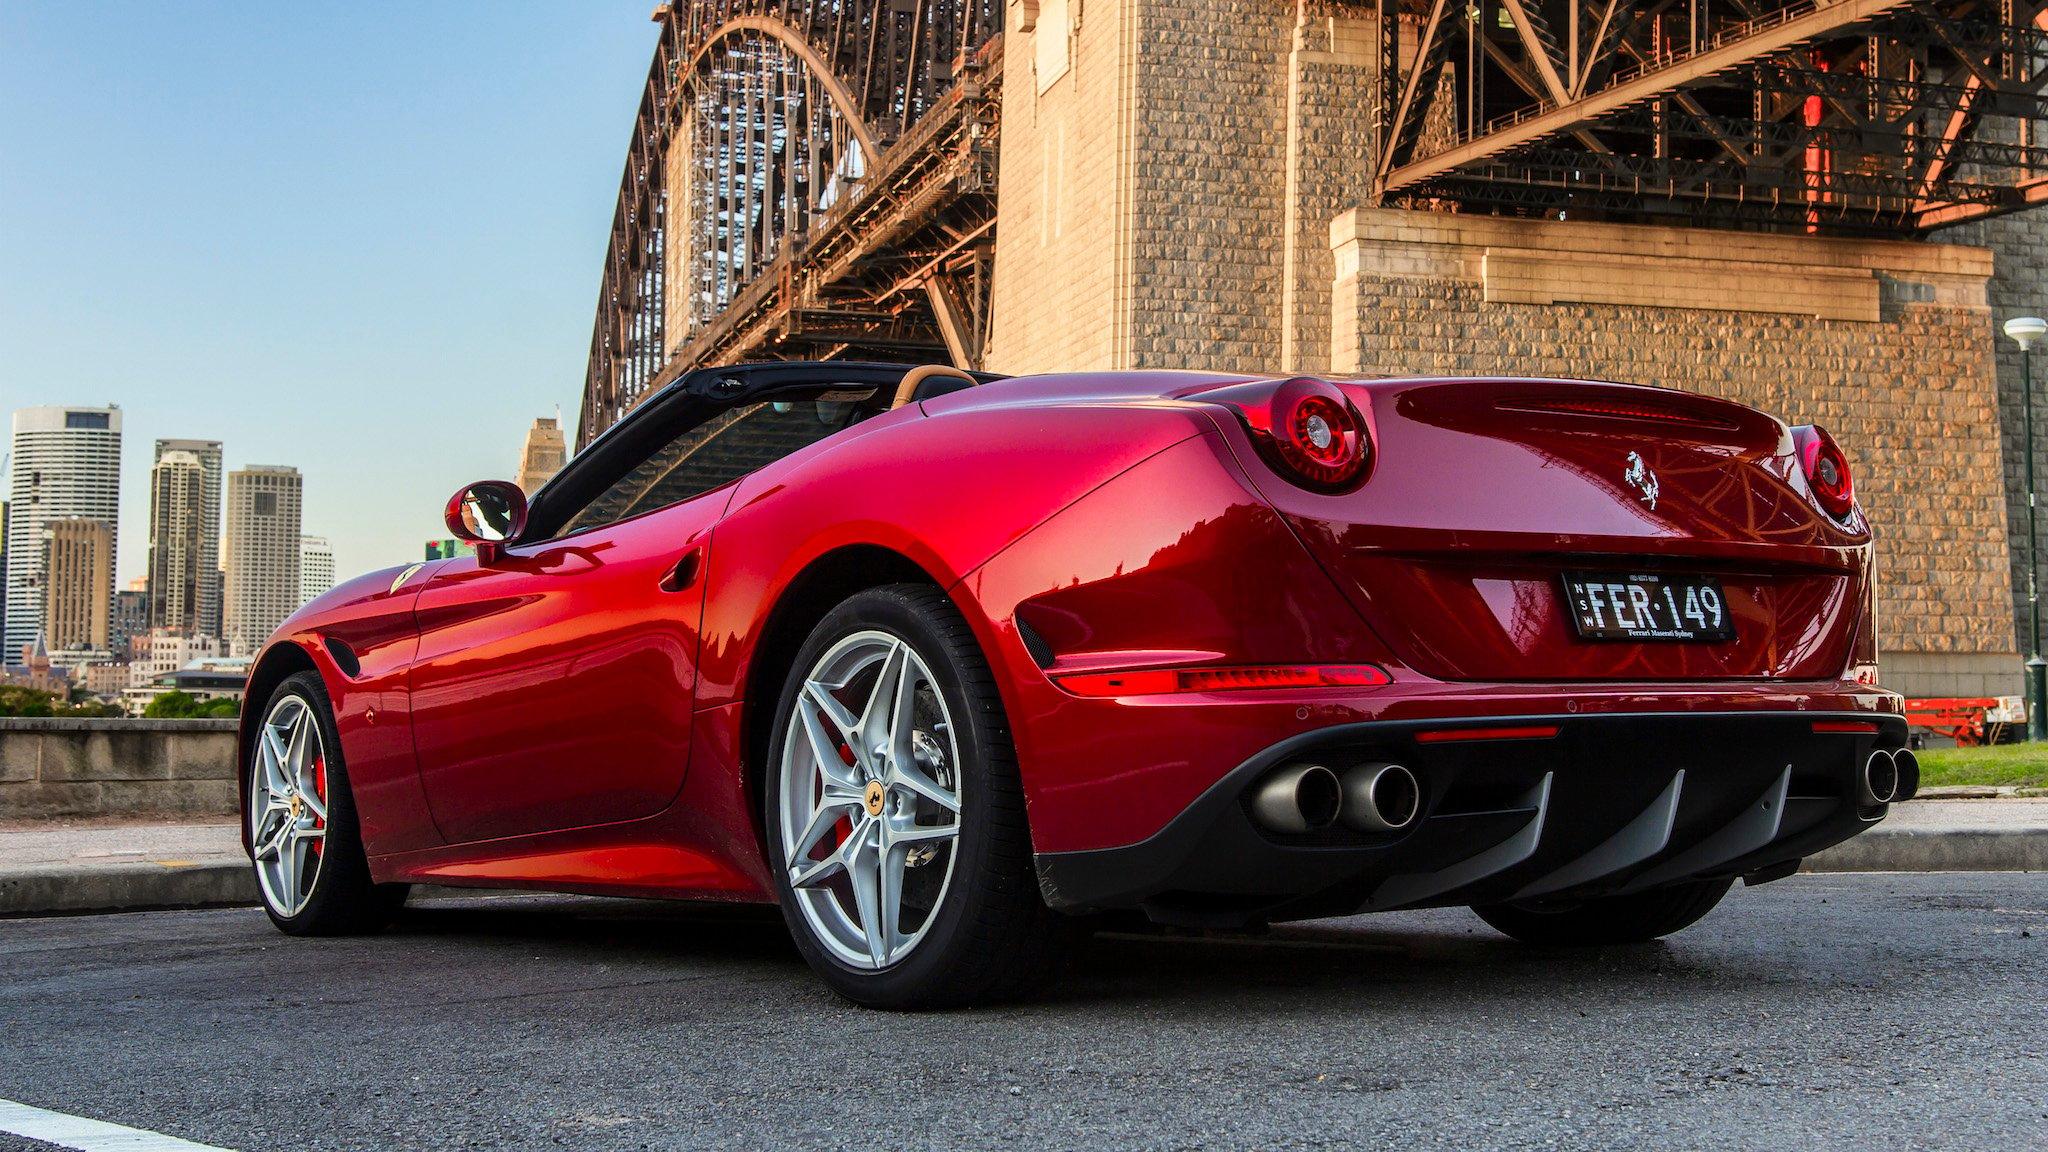 2015 Ferrari California T Review | CarAdvice